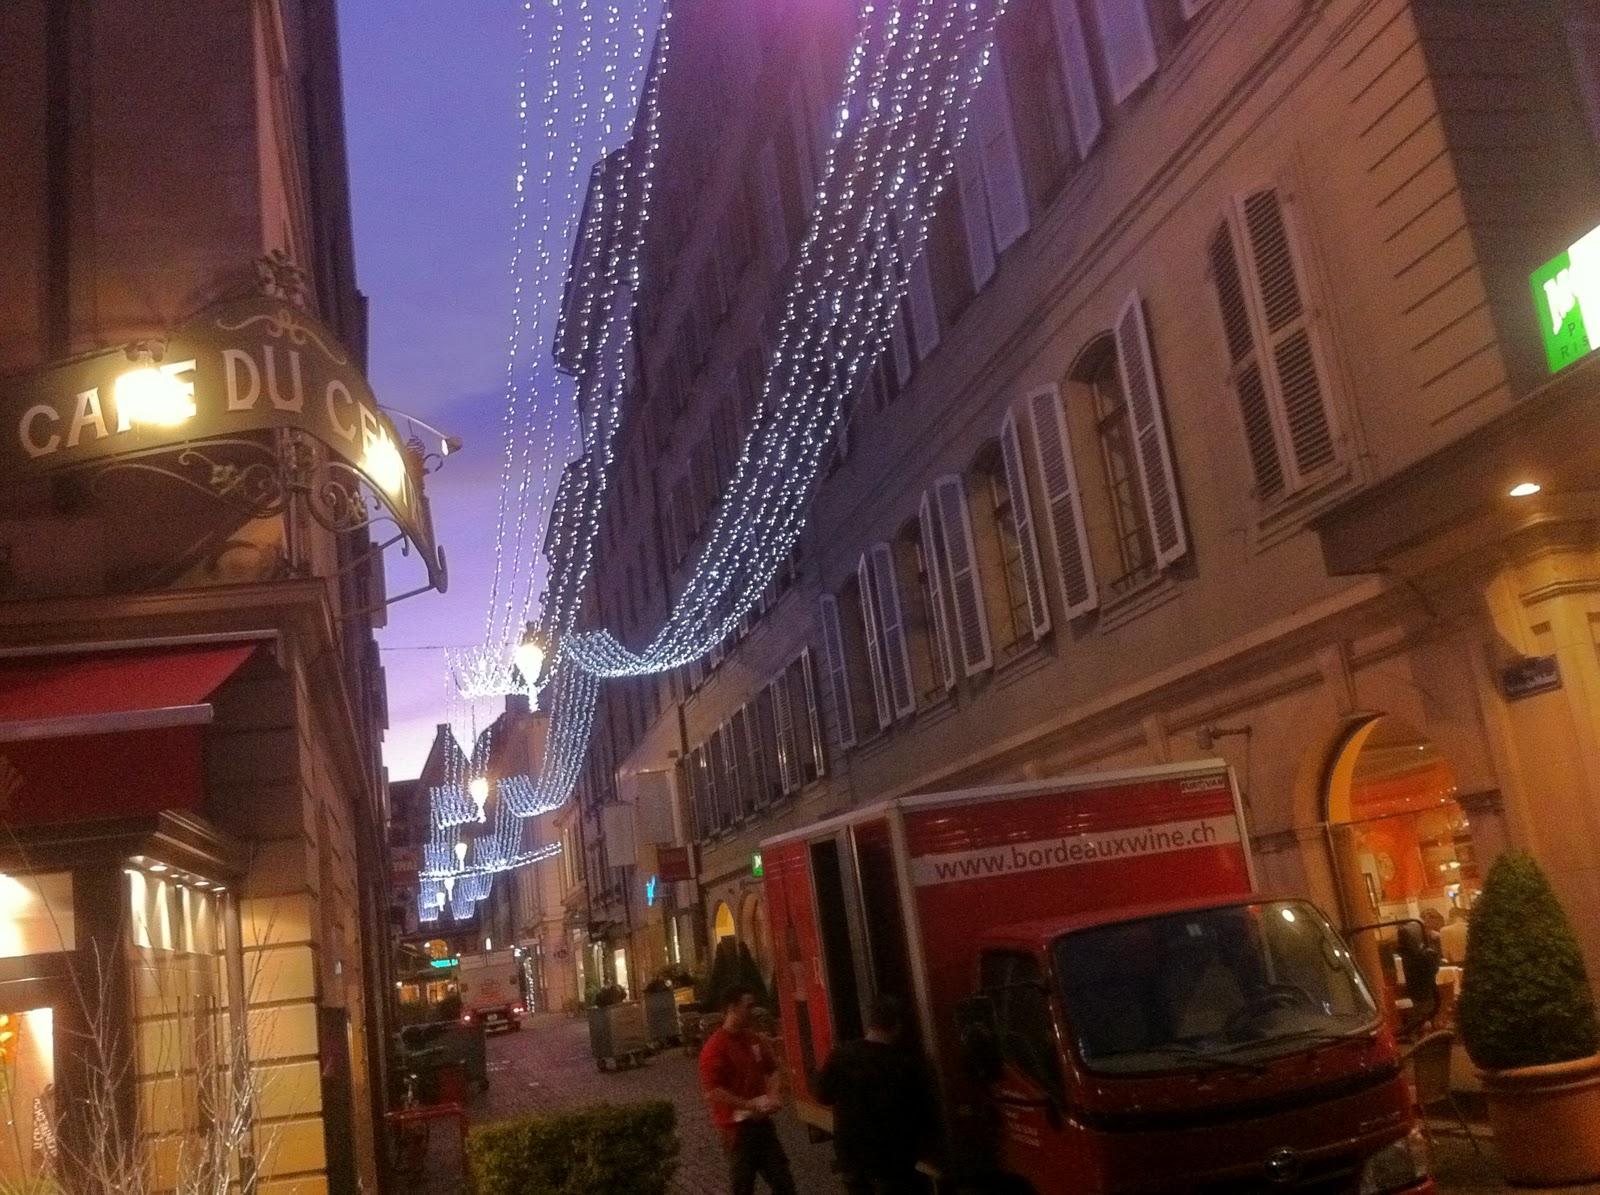 #9B6830 Geneva's Christmas Lights Schwingeninswitzerland 5545 decorations noel geneve 1600x1195 px @ aertt.com